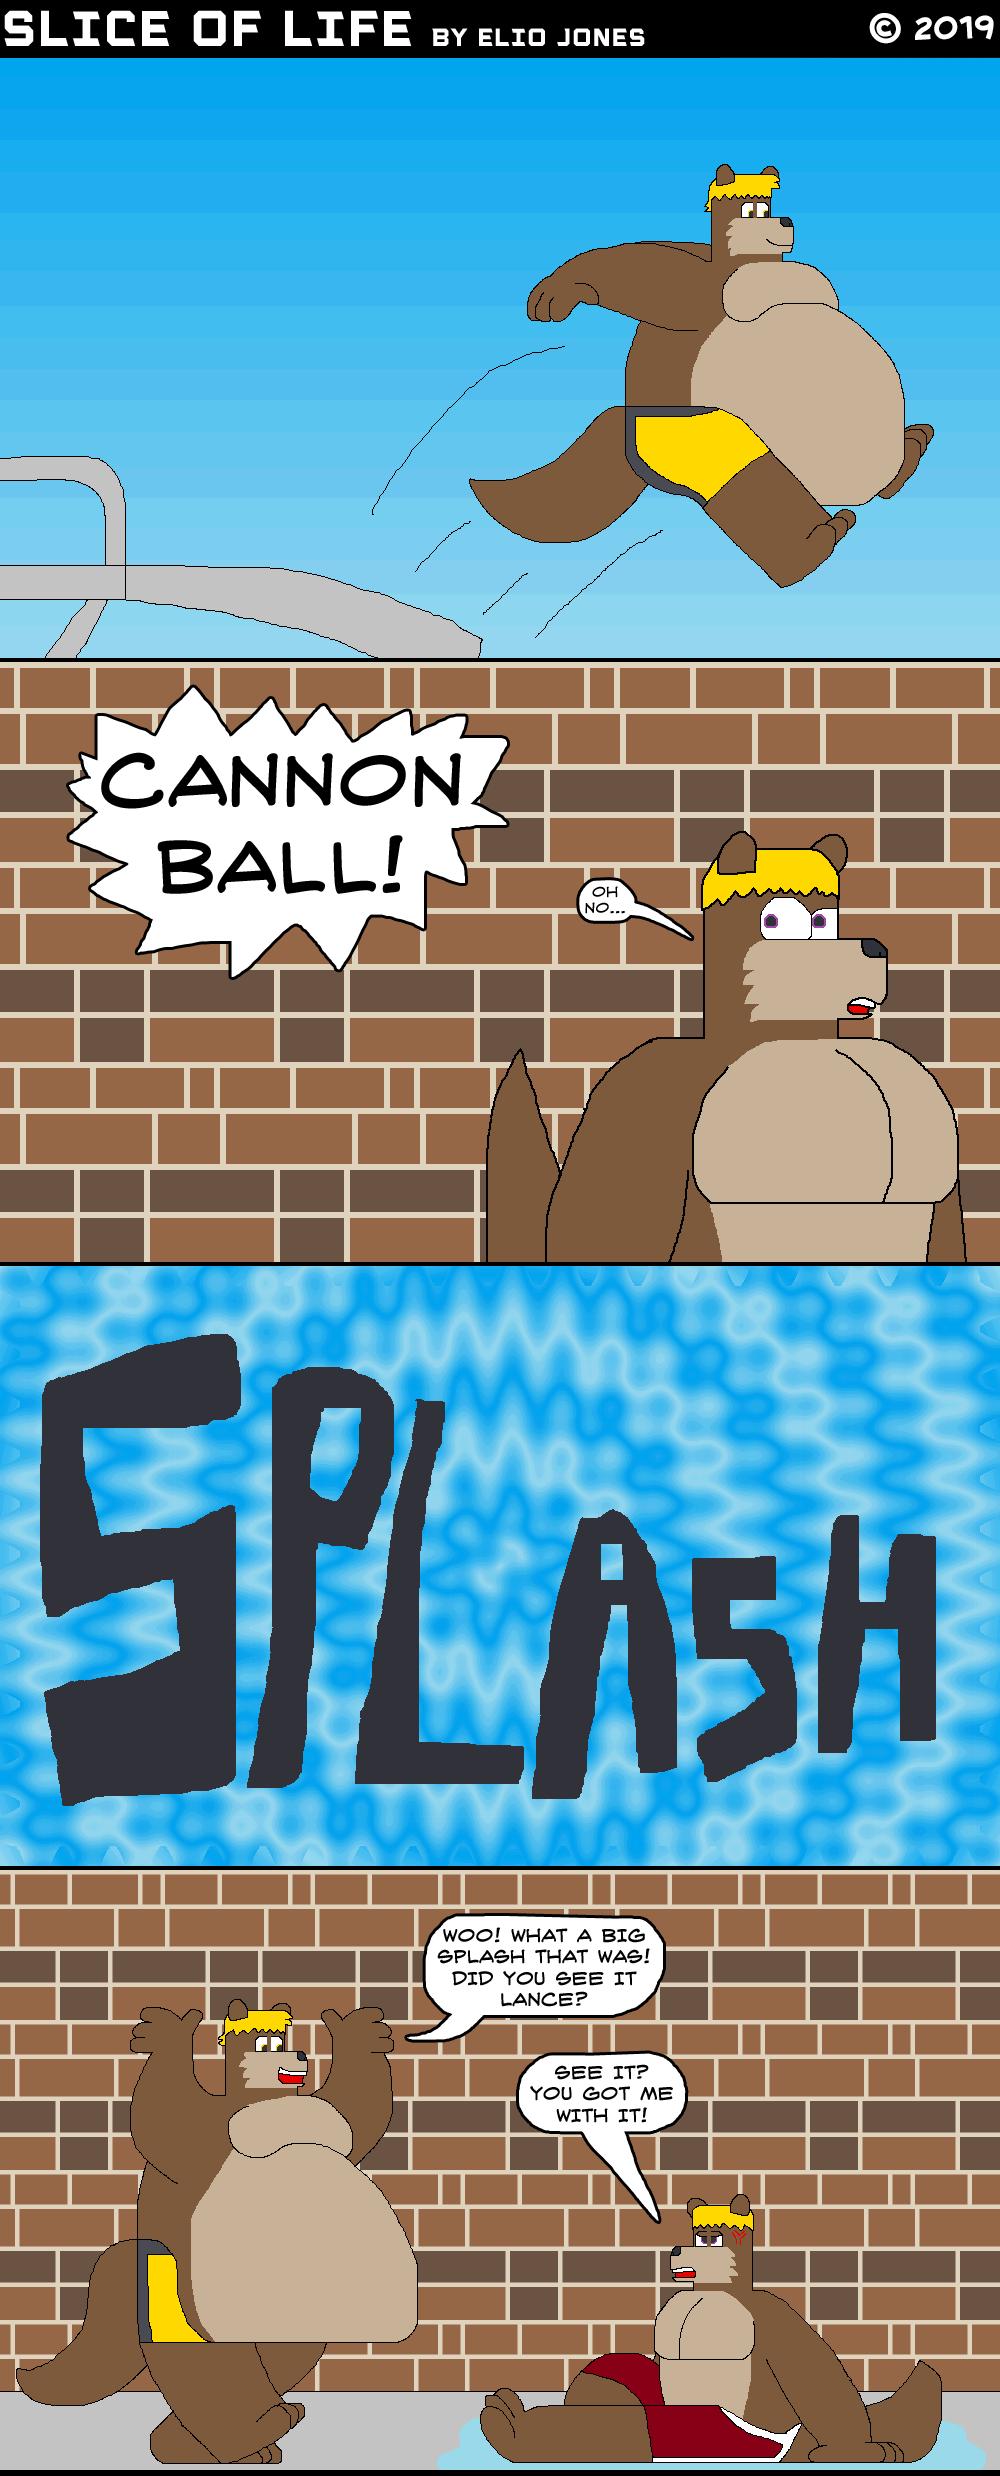 #87: A Big Splash!